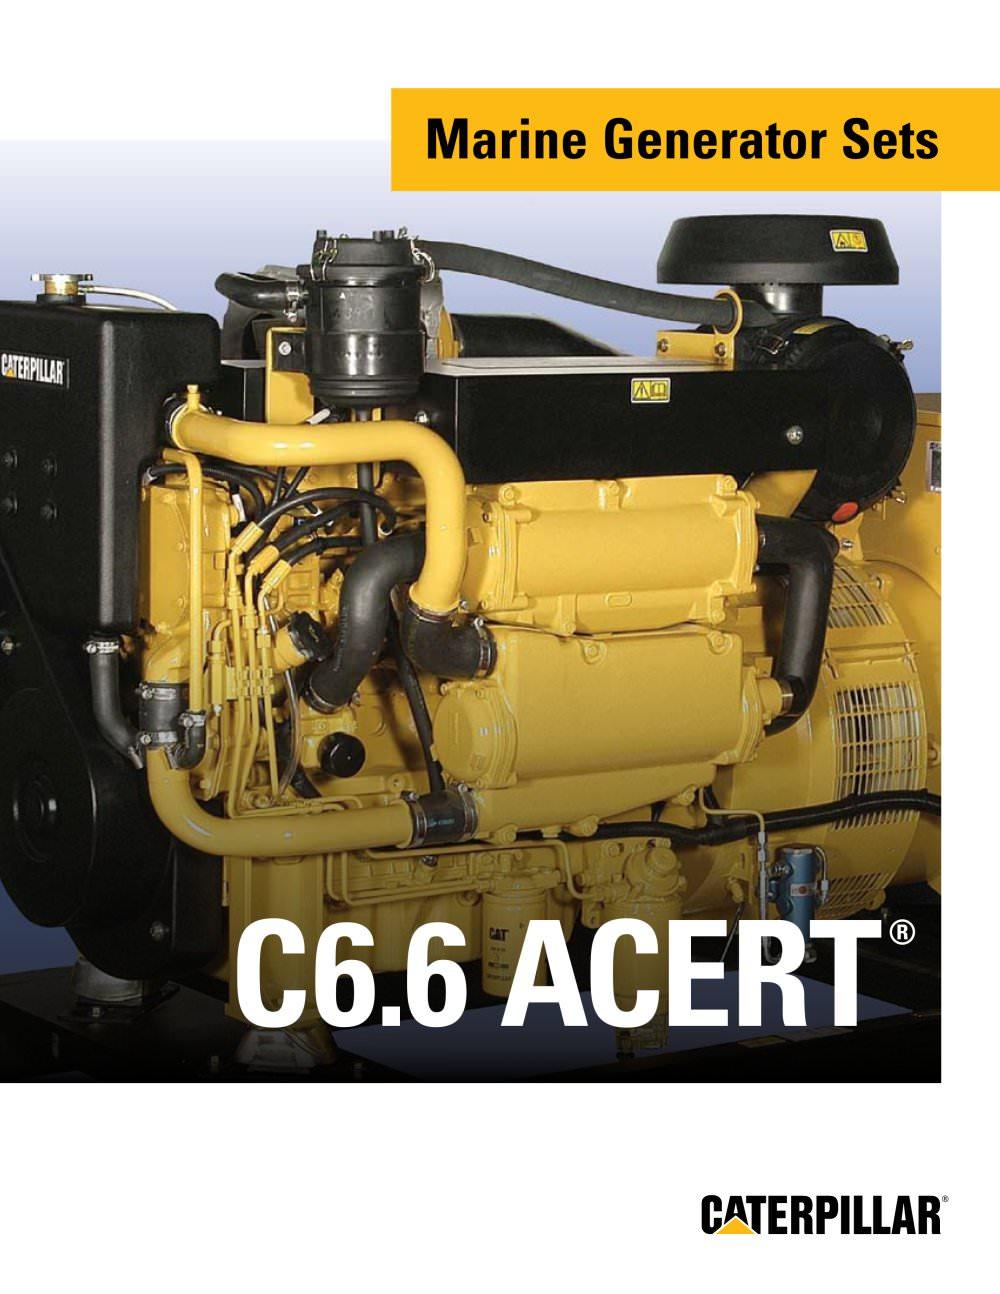 Brochure - Cat C6-6 ACERT Marine Gensets - 1 / 6 Pages